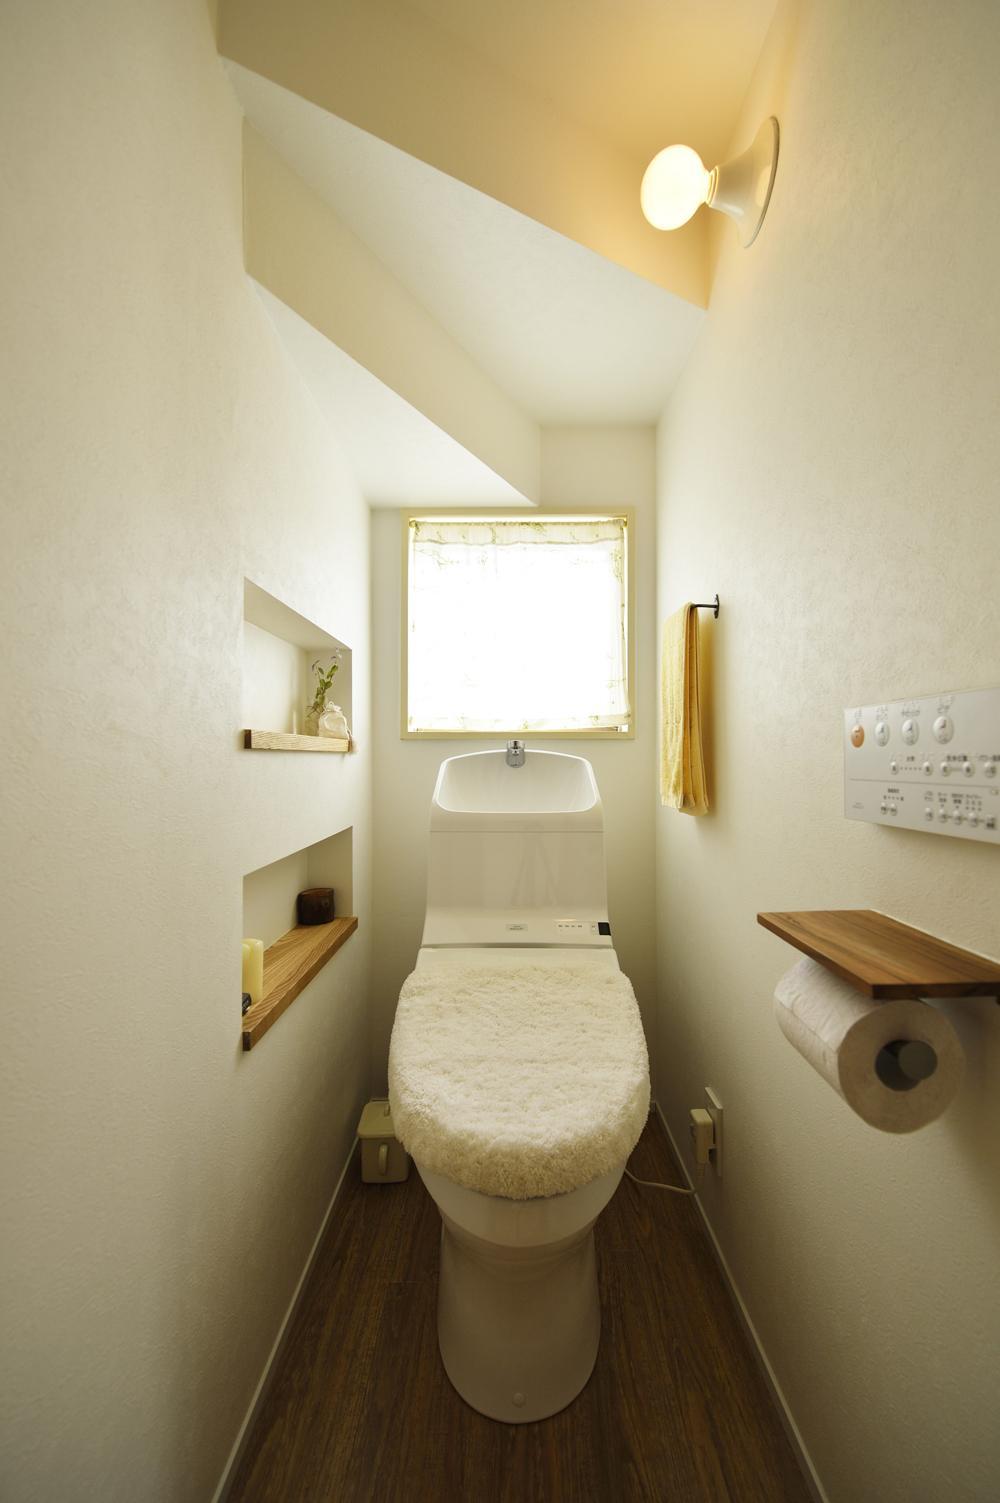 S邸・「解放感!」吹き抜けのある家の写真 階段下のトイレ